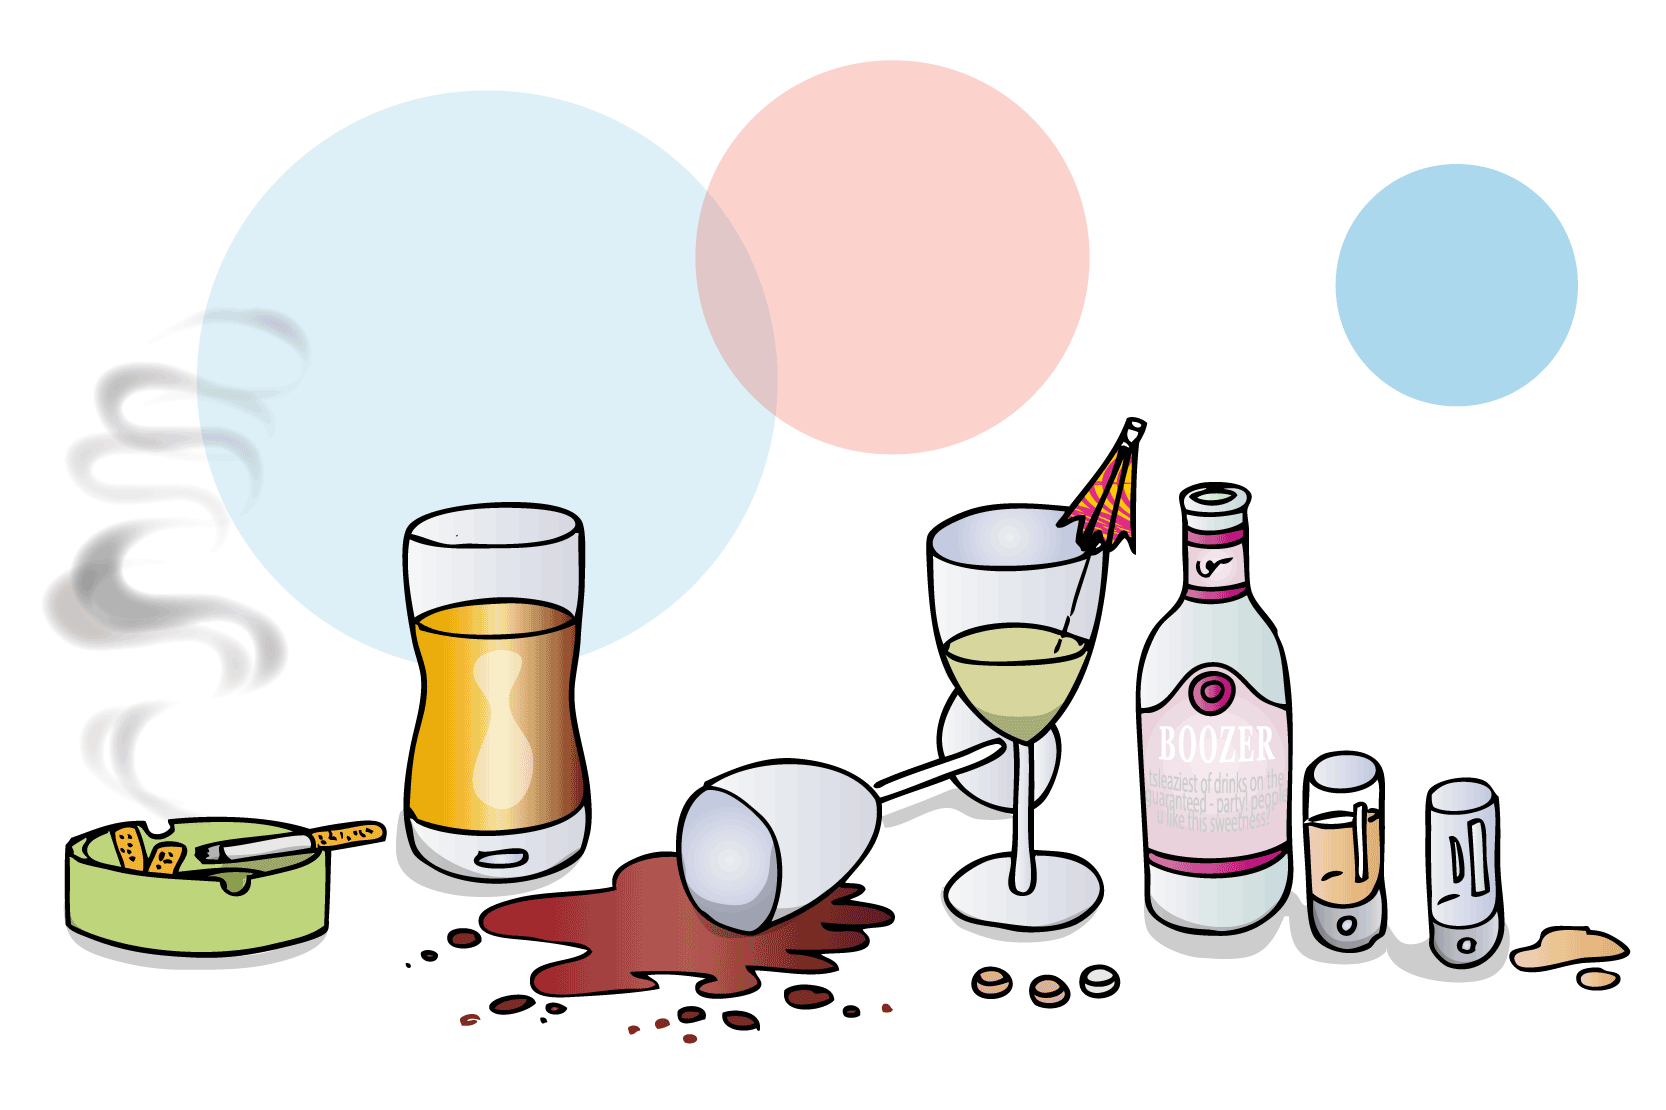 Manga alkoholberoende ser sig inte som missbrukare